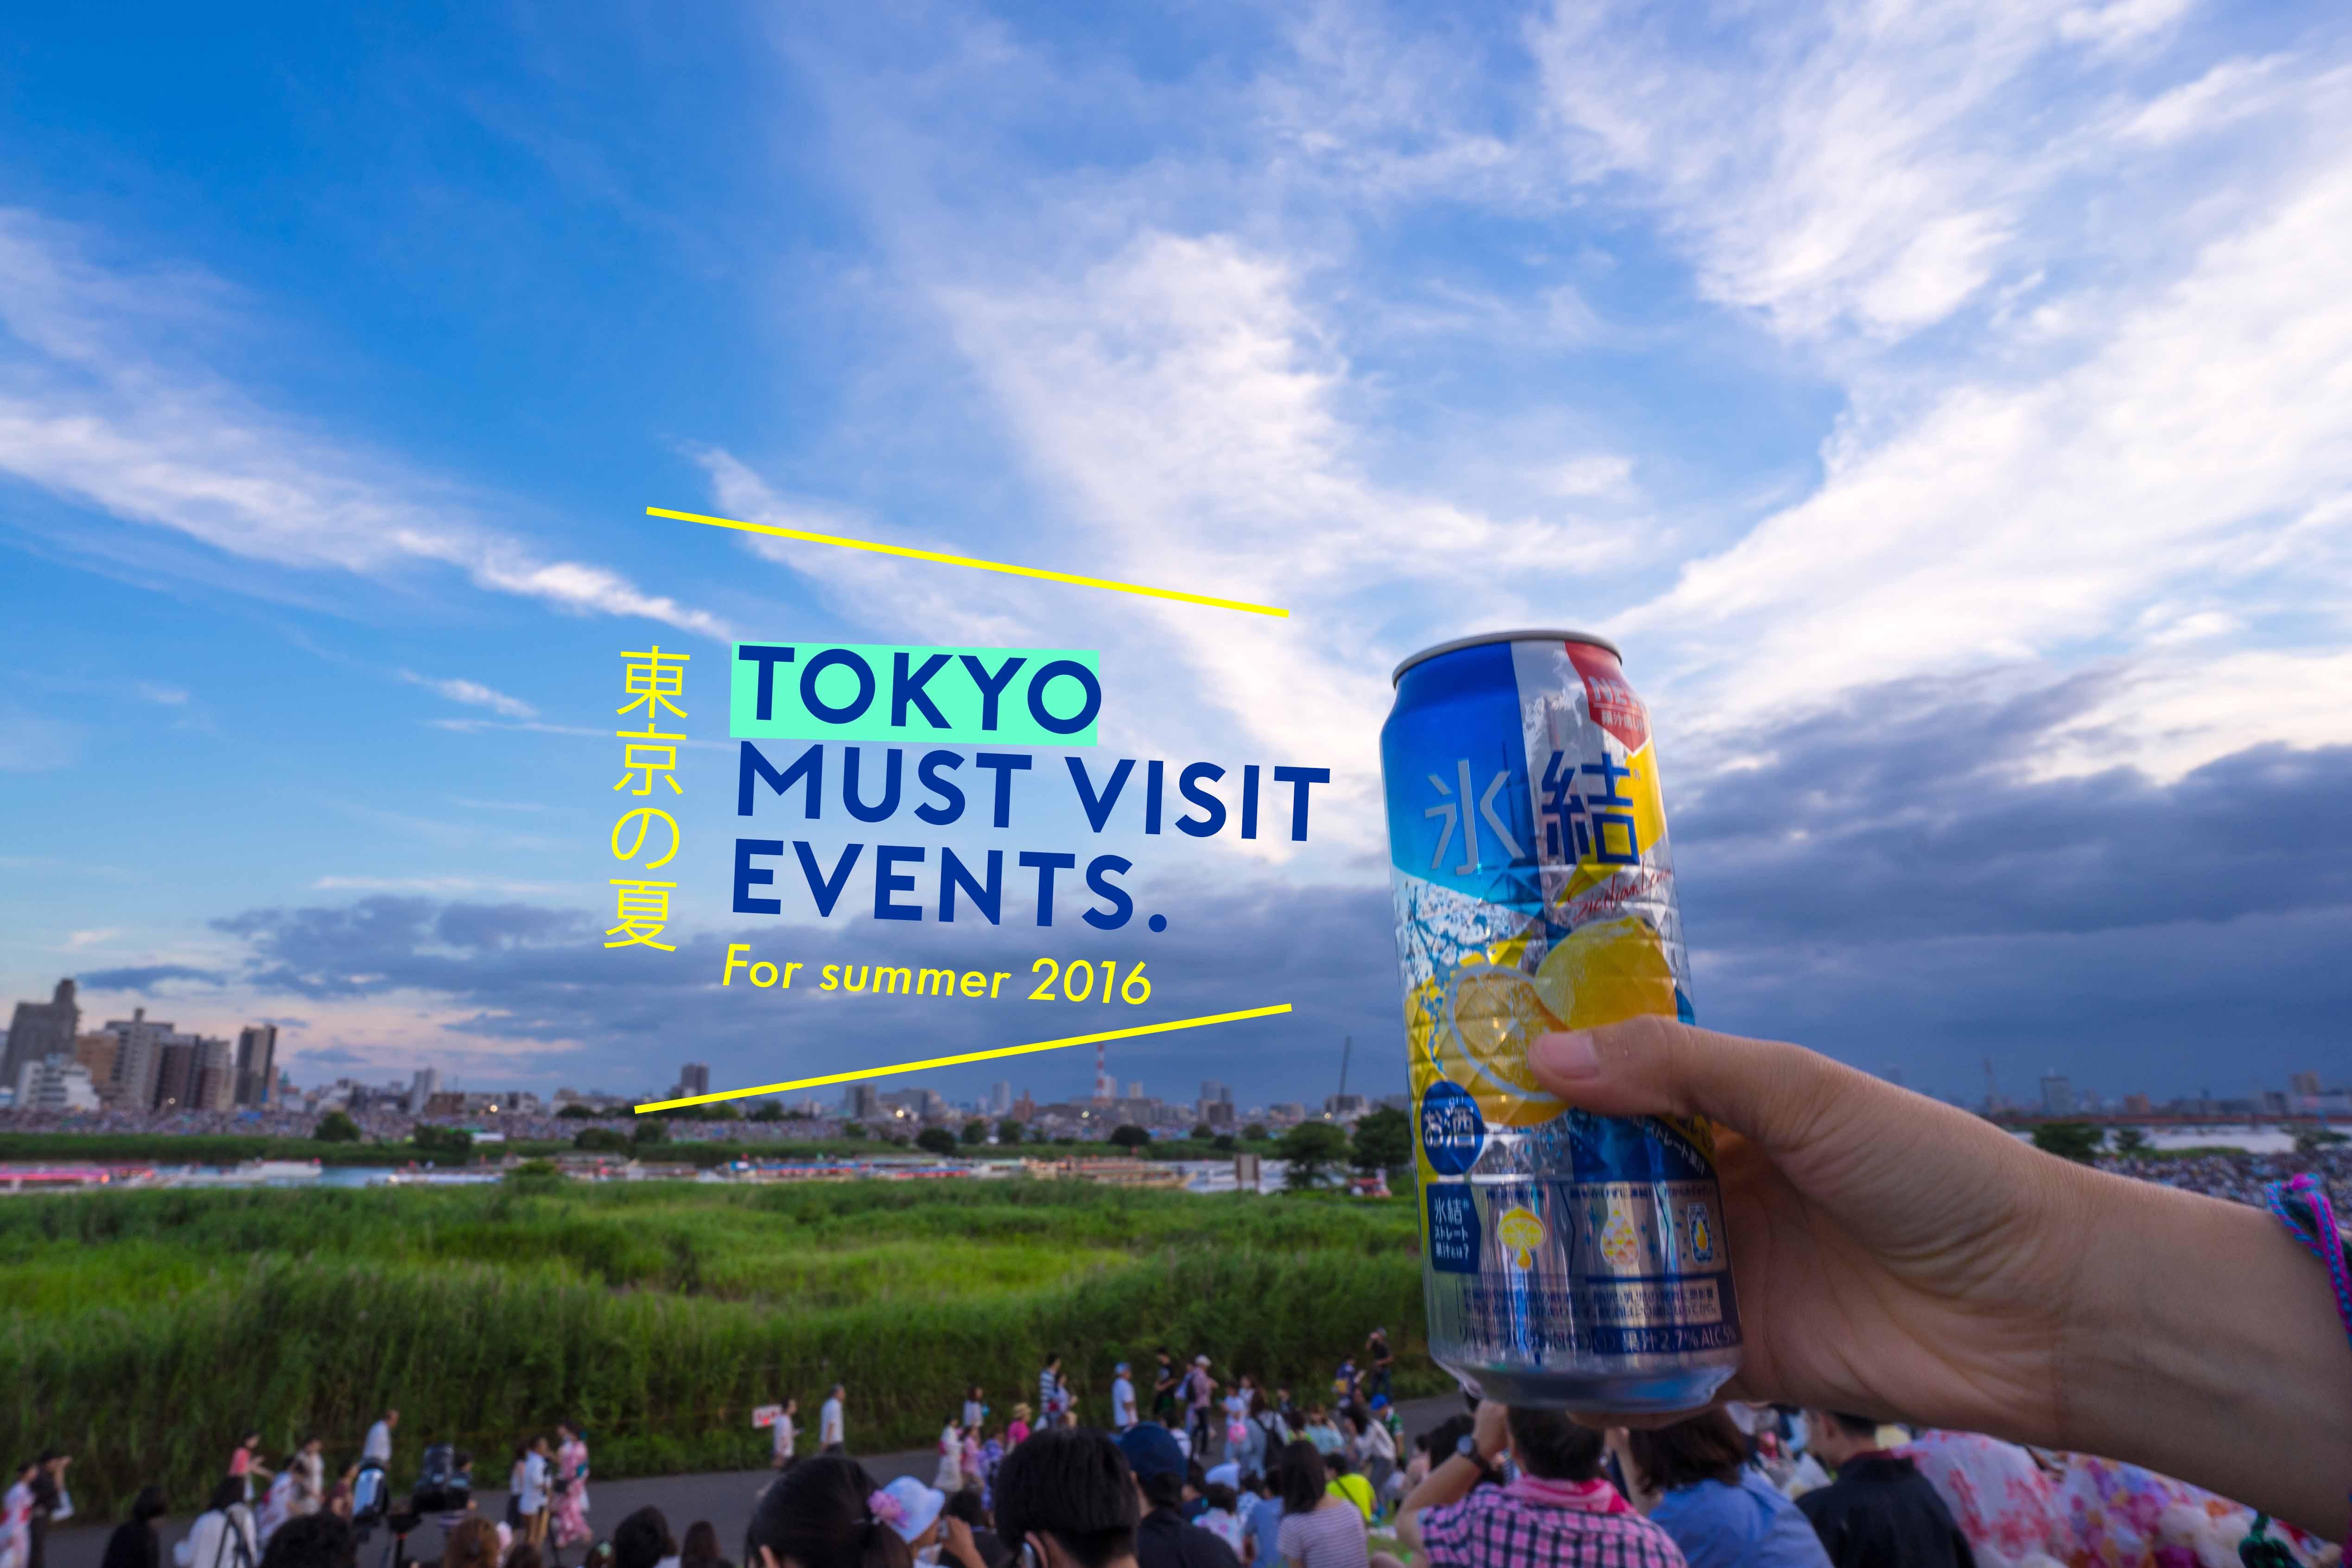 TOKYO, Must visit event (for summer 2016)